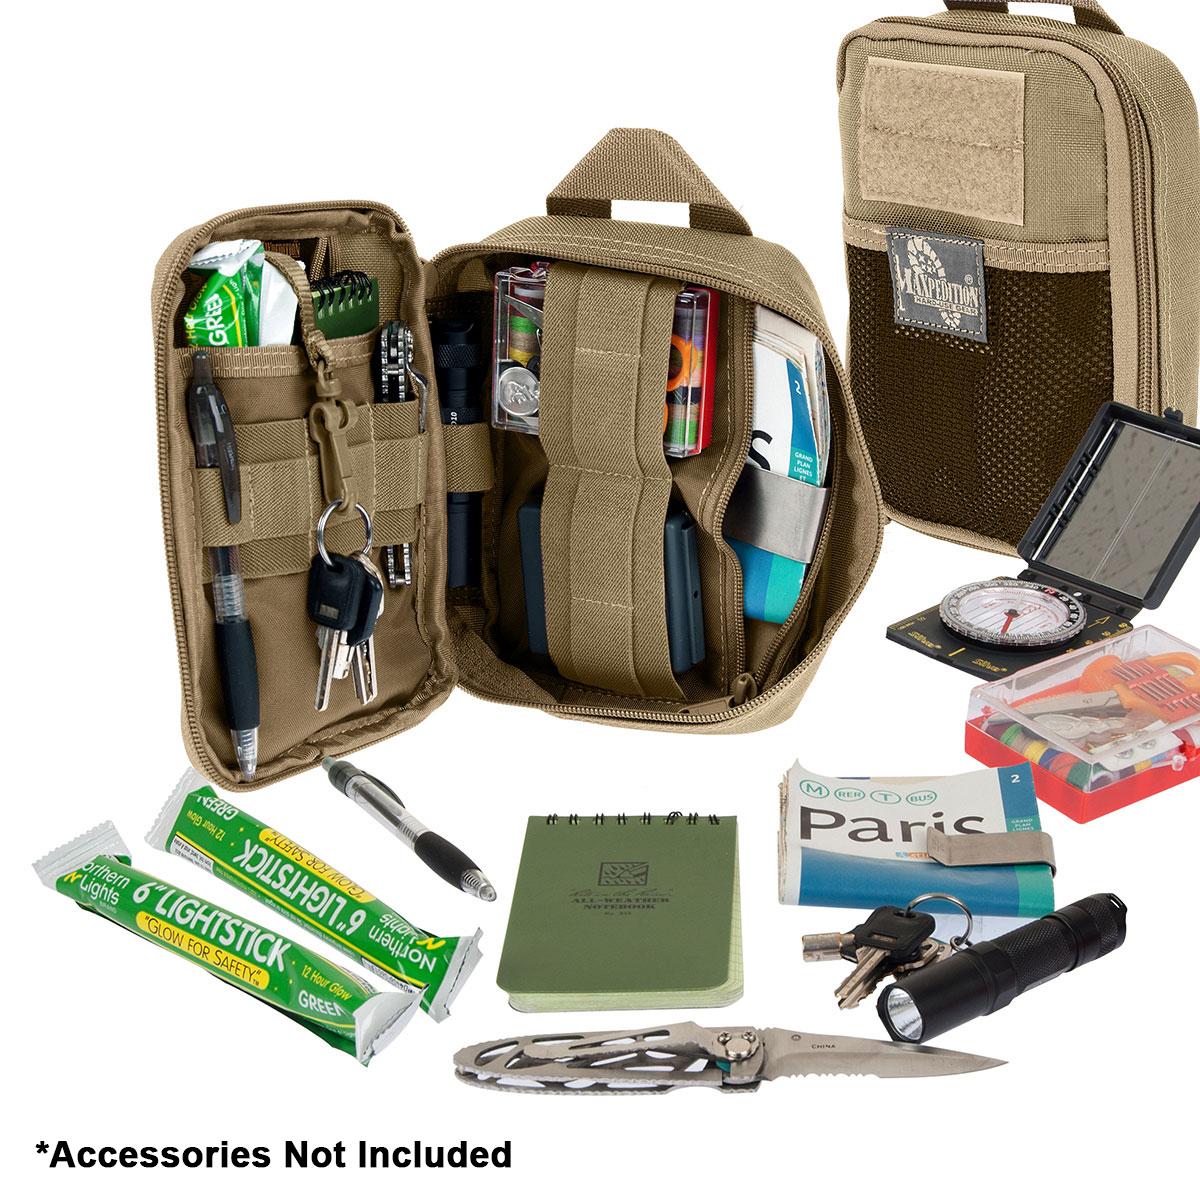 Maxpedition Unterduffel Adventure Bag, Find Complete Details about Maxpedition Unterduffel Adventure Bag,Adventure Bag,Unterduffel Bag,Tactical Bag from Travel Bags Supplier or Manufacturer-Qingdao Phoenix Bags Co., Ltd.